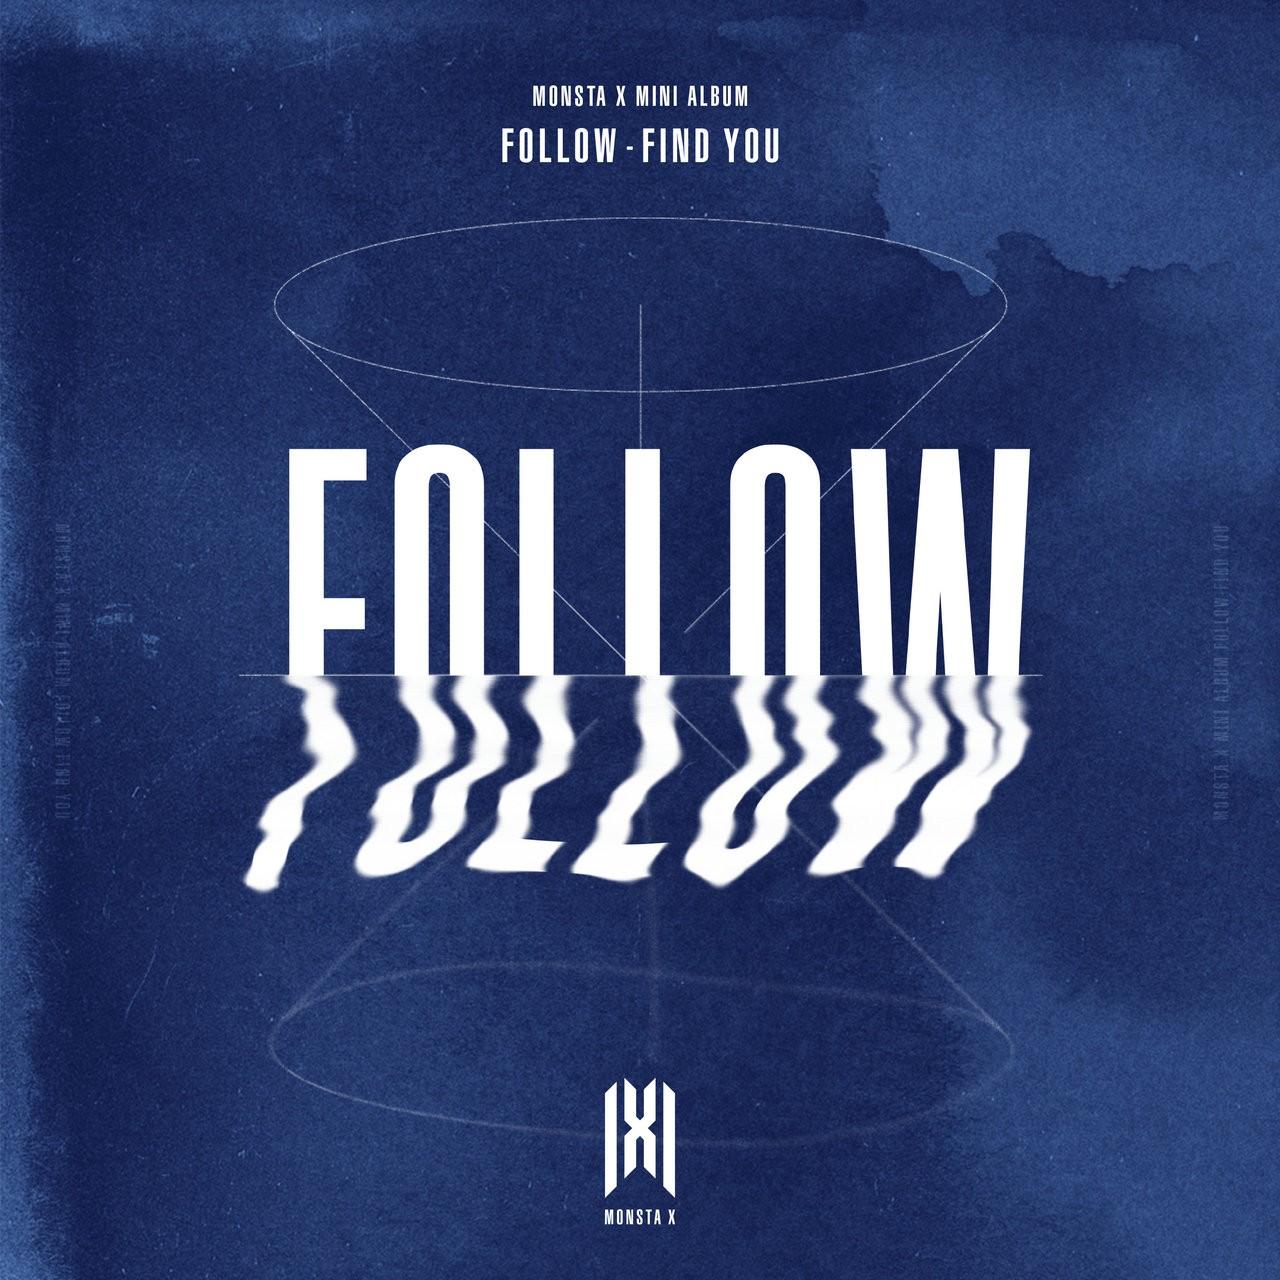 MONSTA X – FOLLOW – FIND YOU [FLAC + MP3 320 / WEB] [2019.10.28]